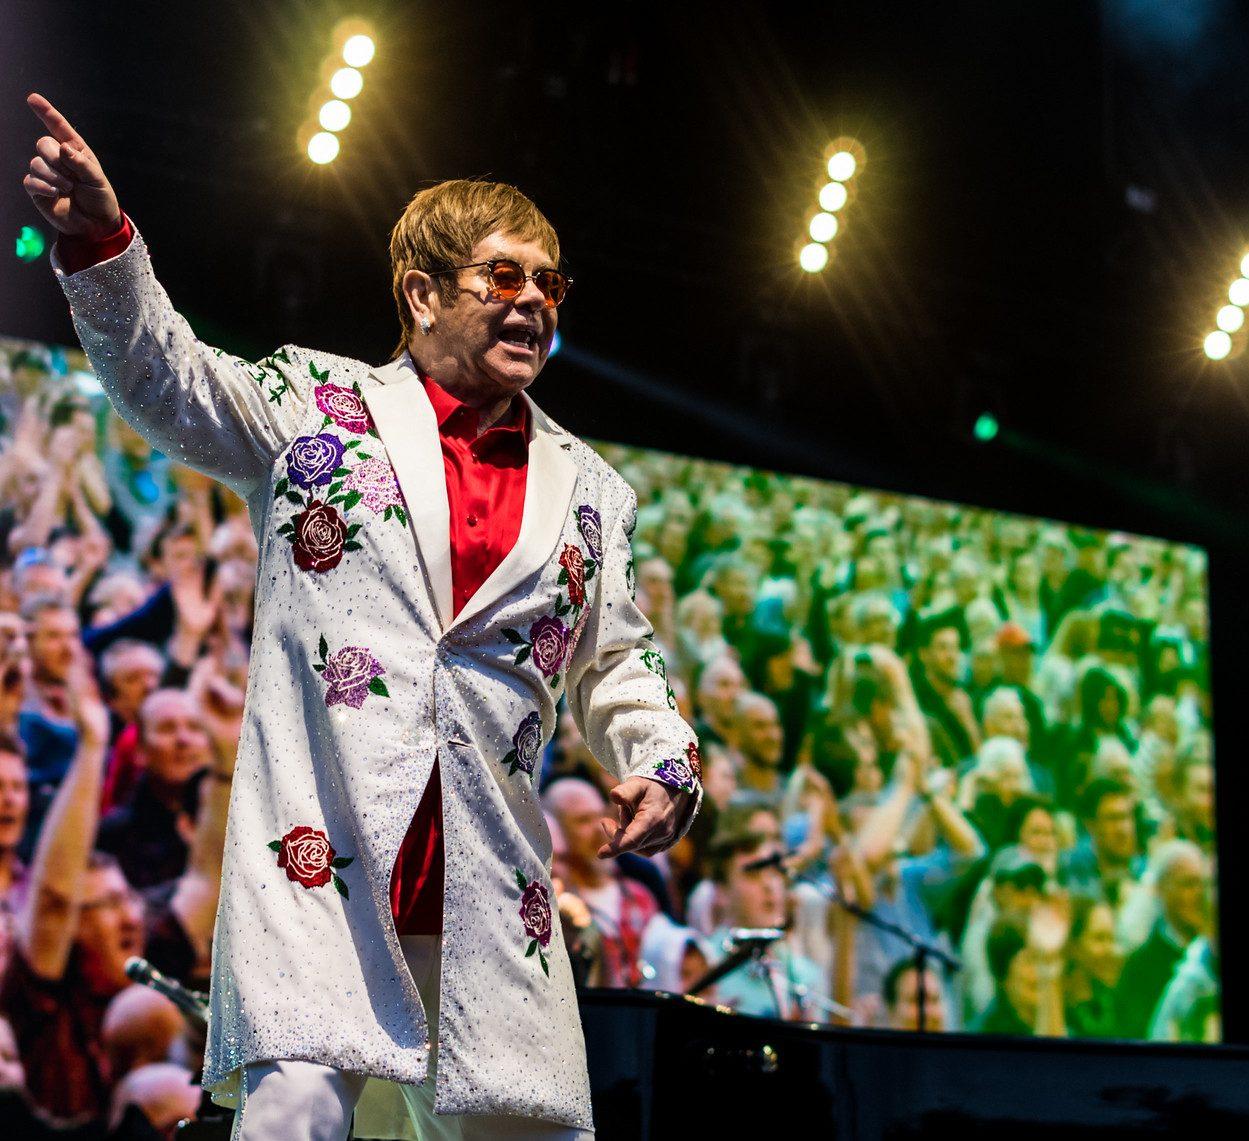 34966593551 9e79b8d746 k e1616674096776 23 Things You Didn't Know About Elton John